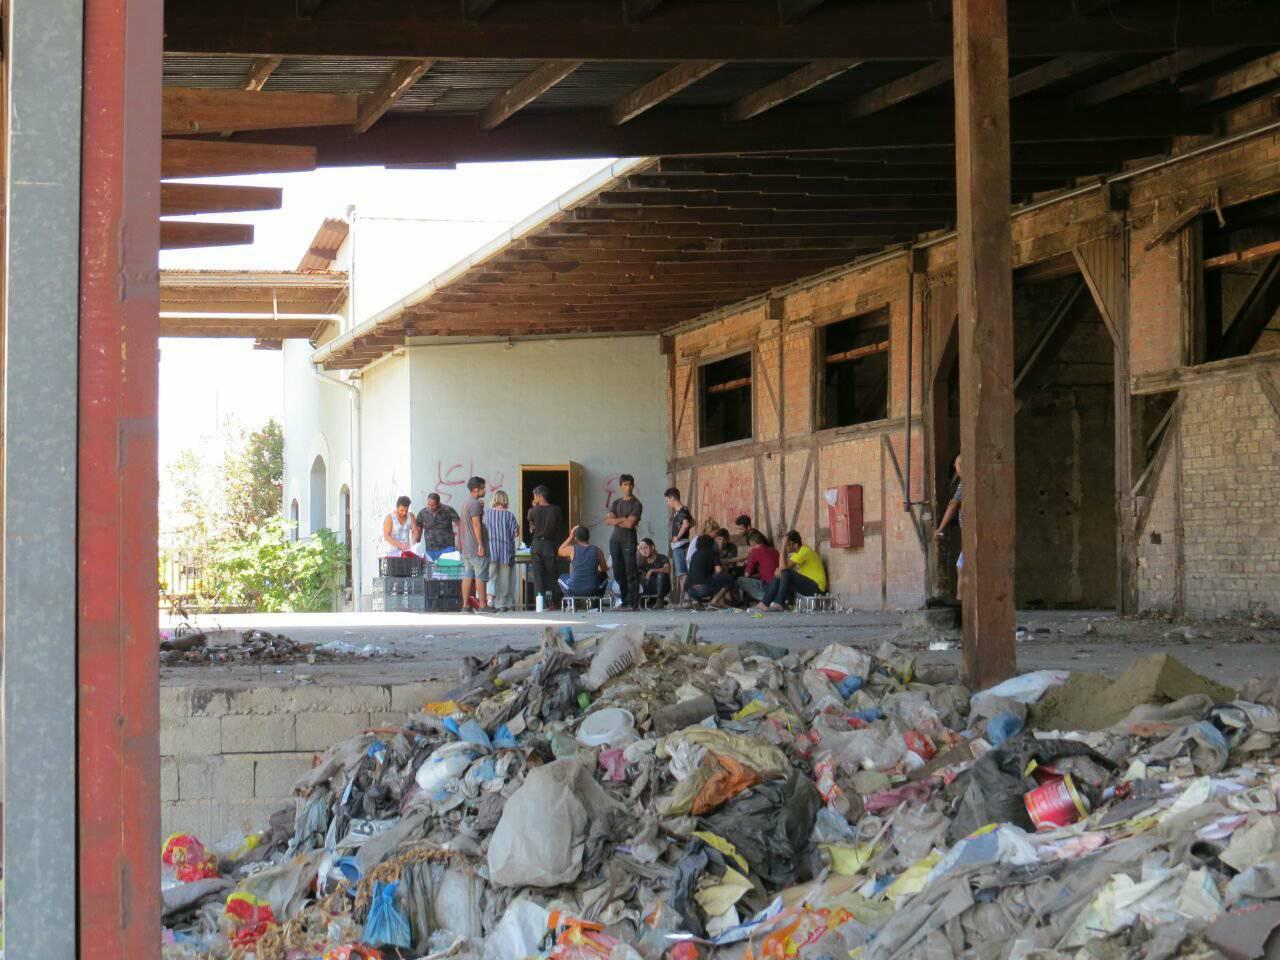 Izbjeglice i migranti u Patras (foto Alexandra Menschick)